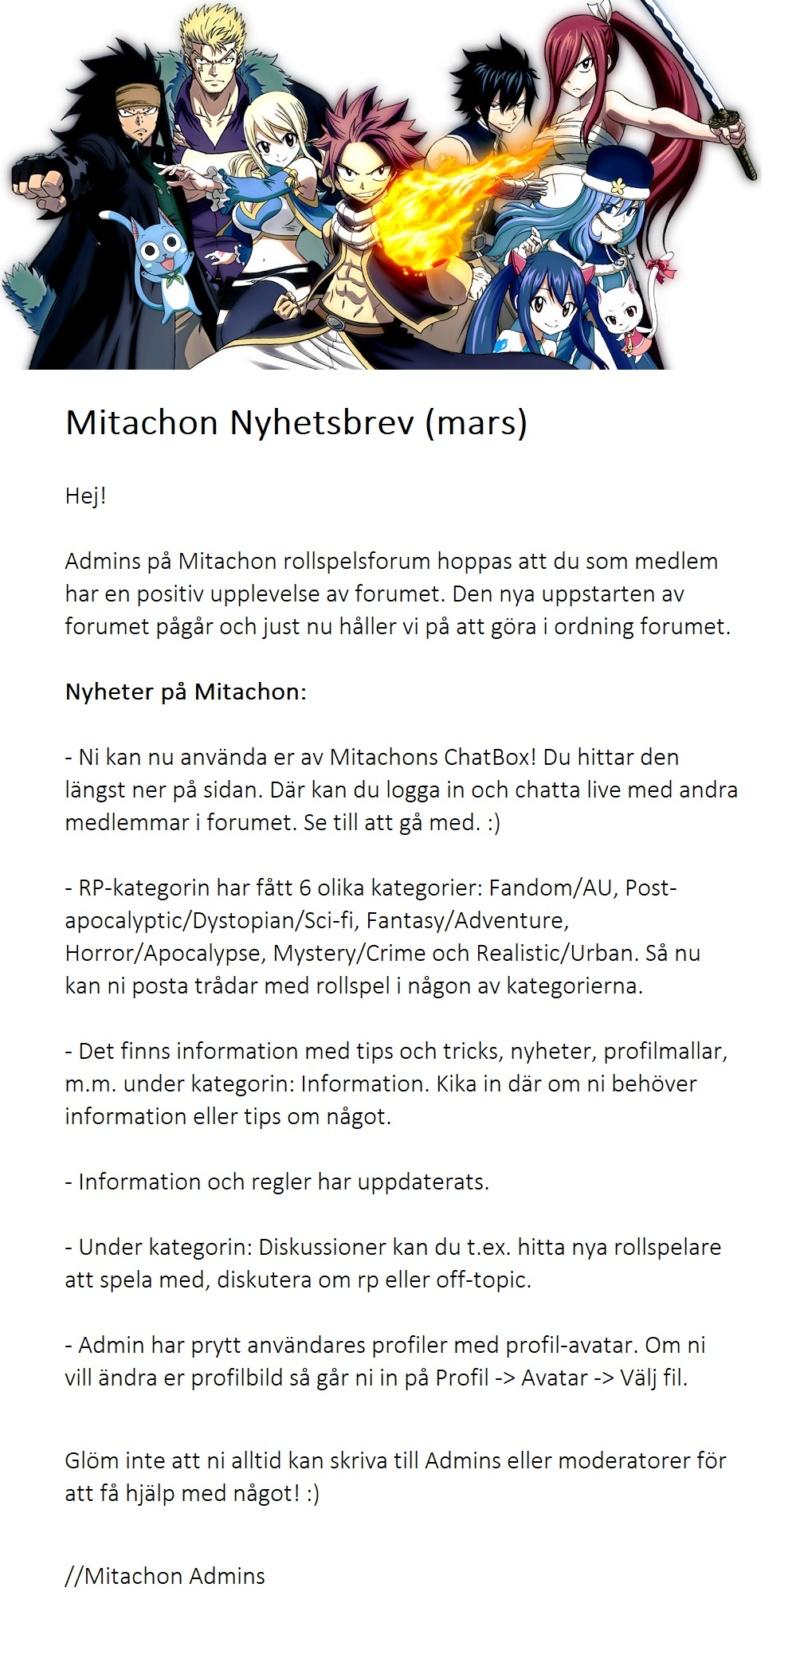 Mitachon Nyhetsbrev (Mars 2019) Mitach11